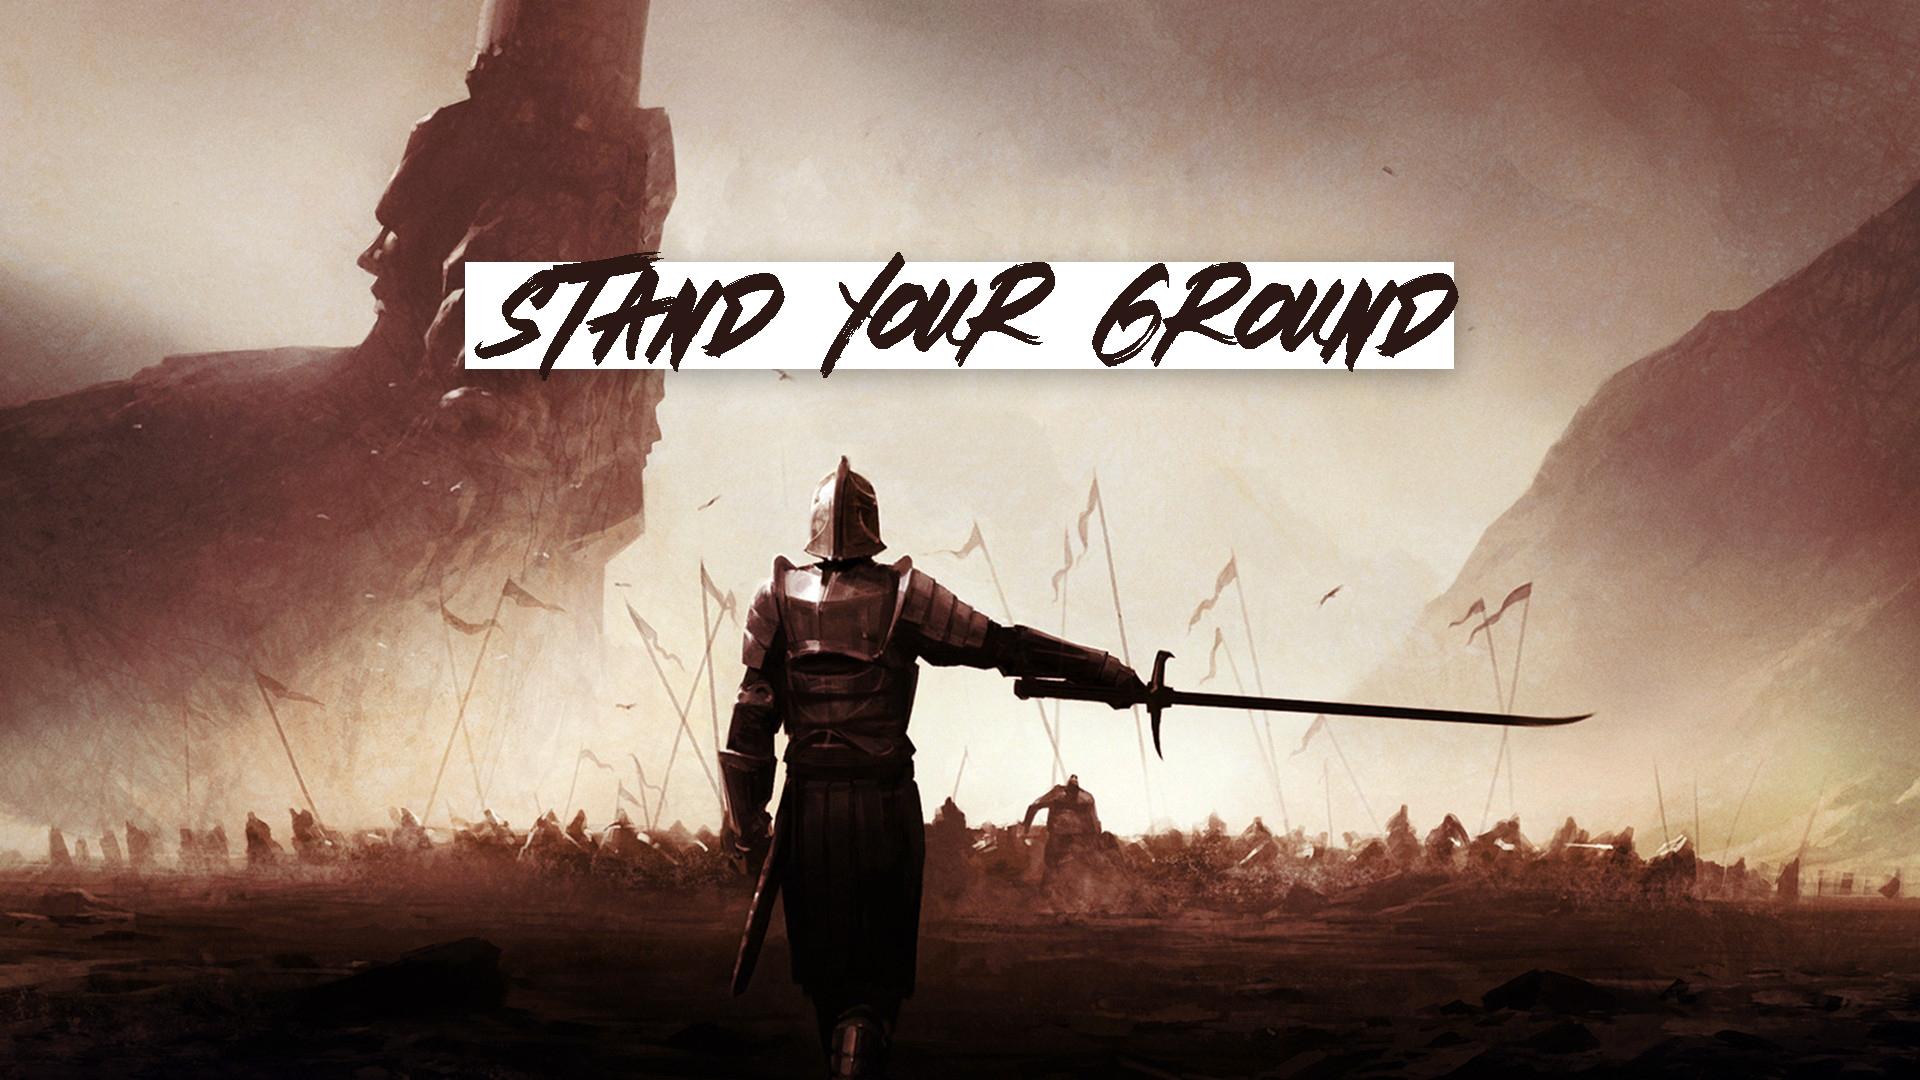 Stand Your Ground Slide.jpg